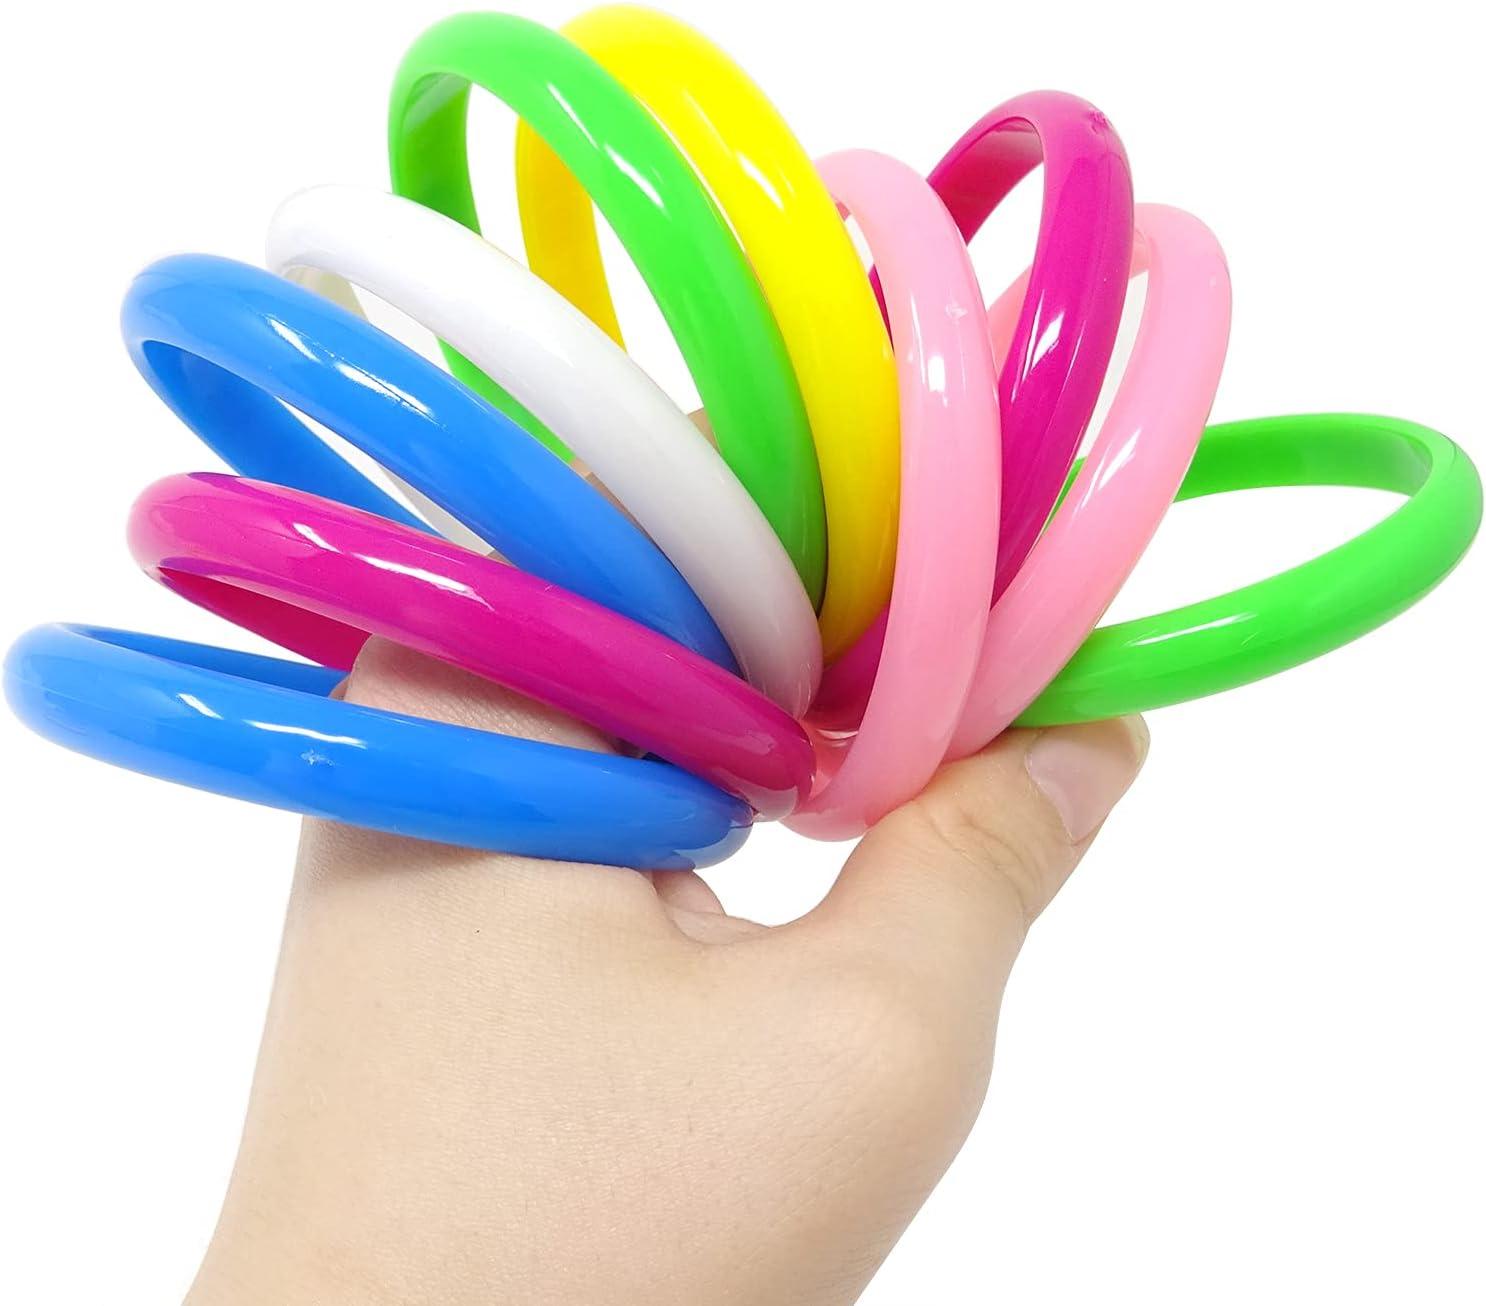 6 Color Honbay 12PCS Cute Candy Color Plastic Bangle Bracelets Party Favors for Party Decorations Indoor Outdoor